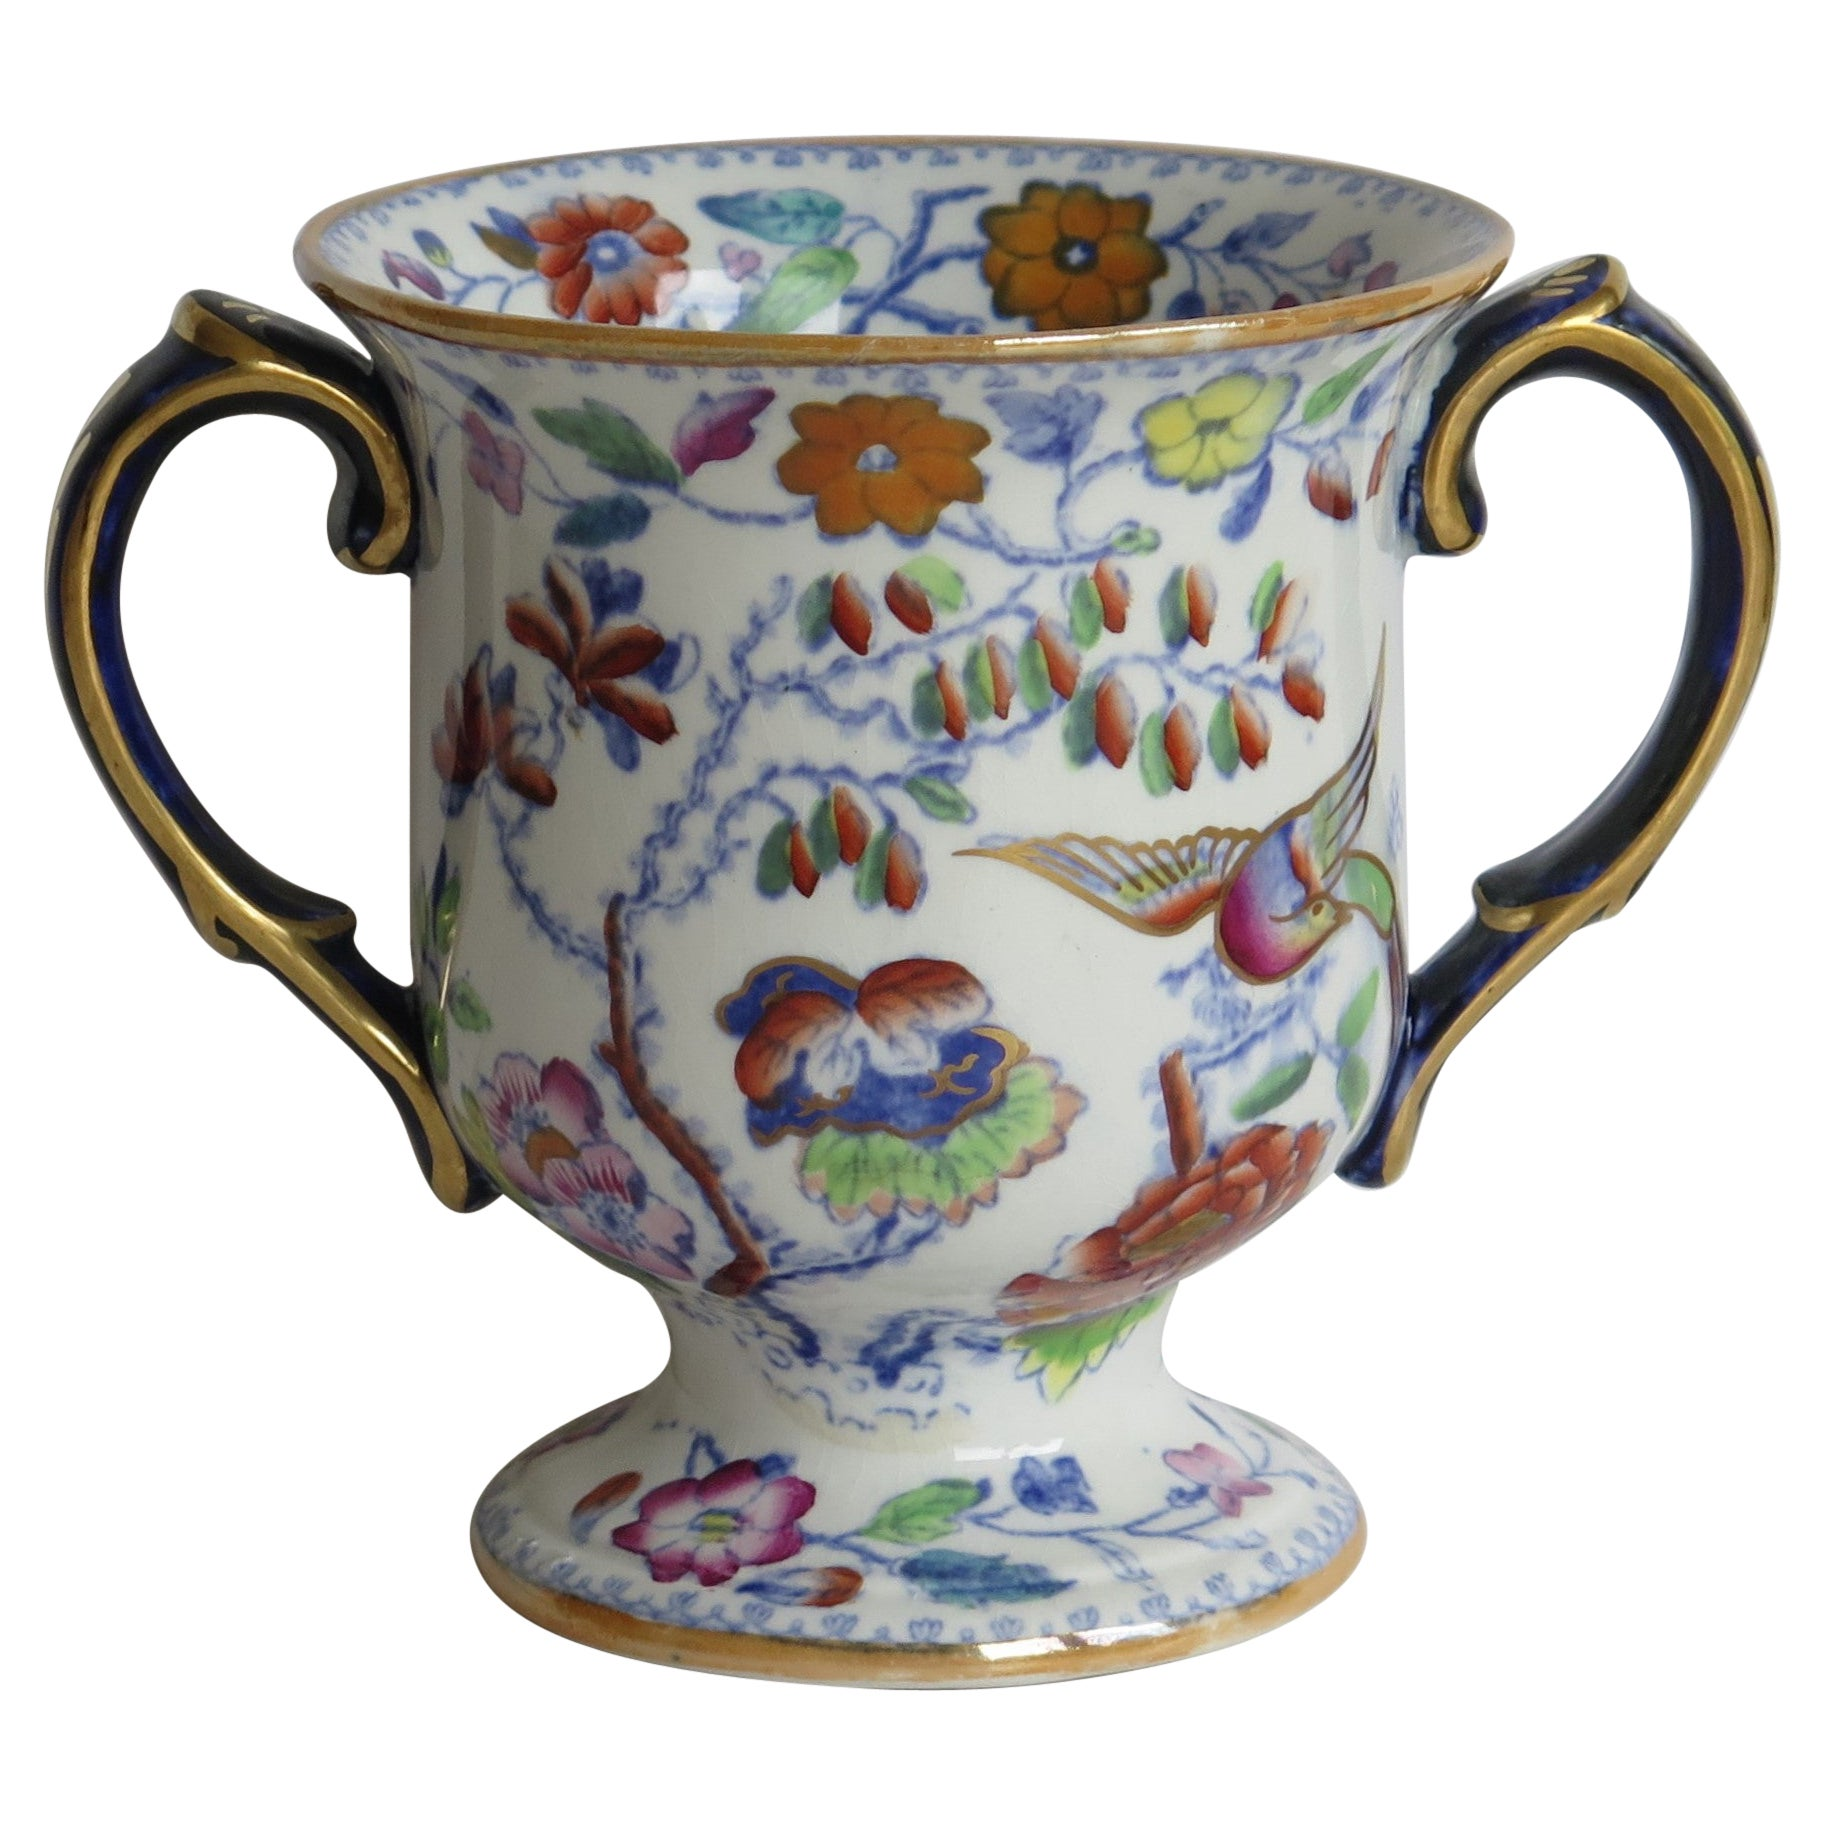 Rare Mason's Ironstone Loving Cup or Small Vase Flying Bird Pattern, Circa 1860